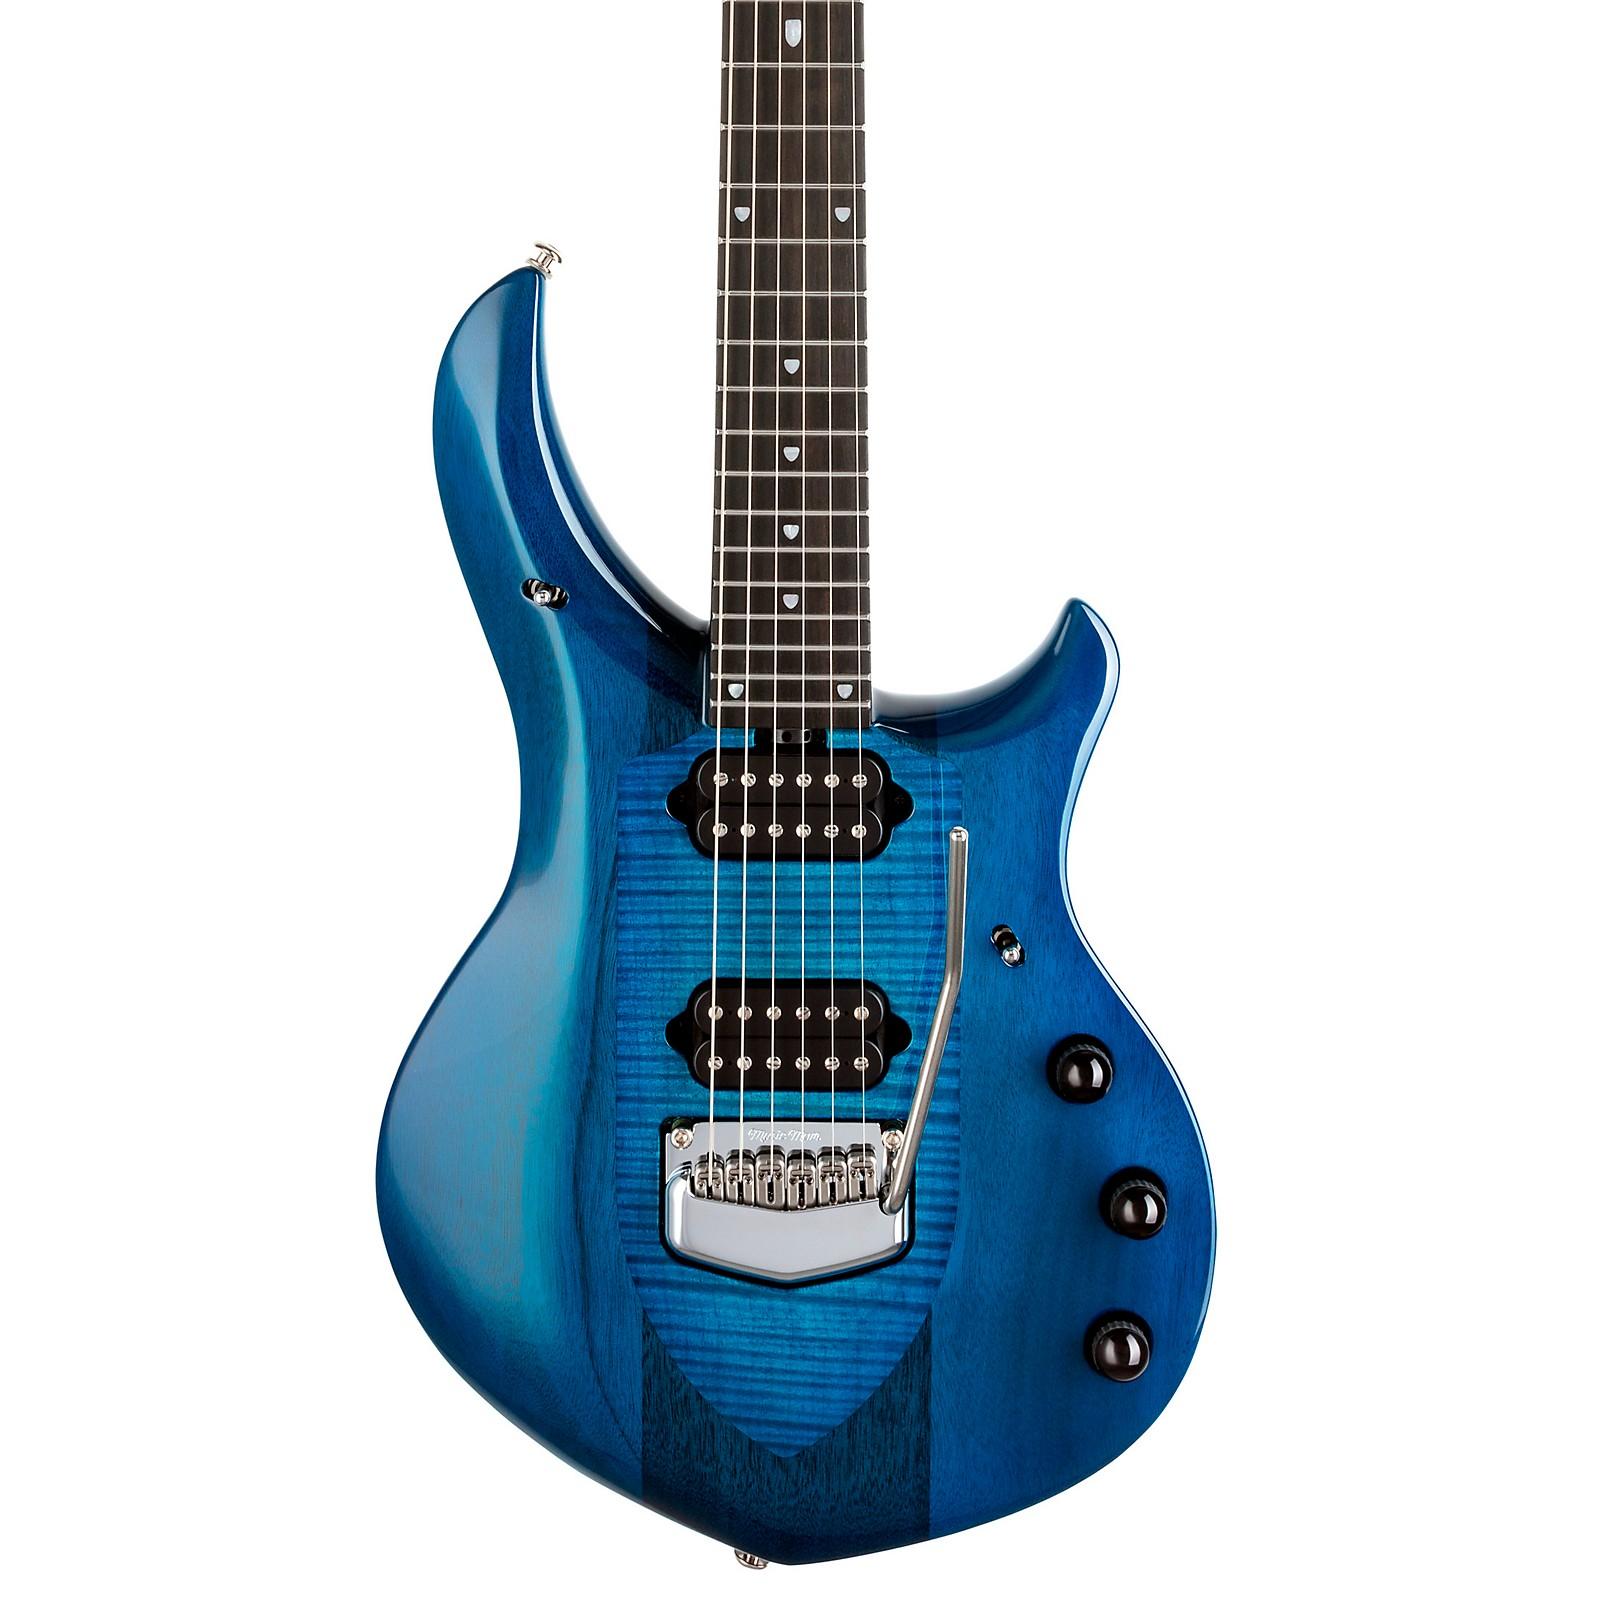 Ernie Ball Music Man John Petrucci Majesty 6 Electric Guitar